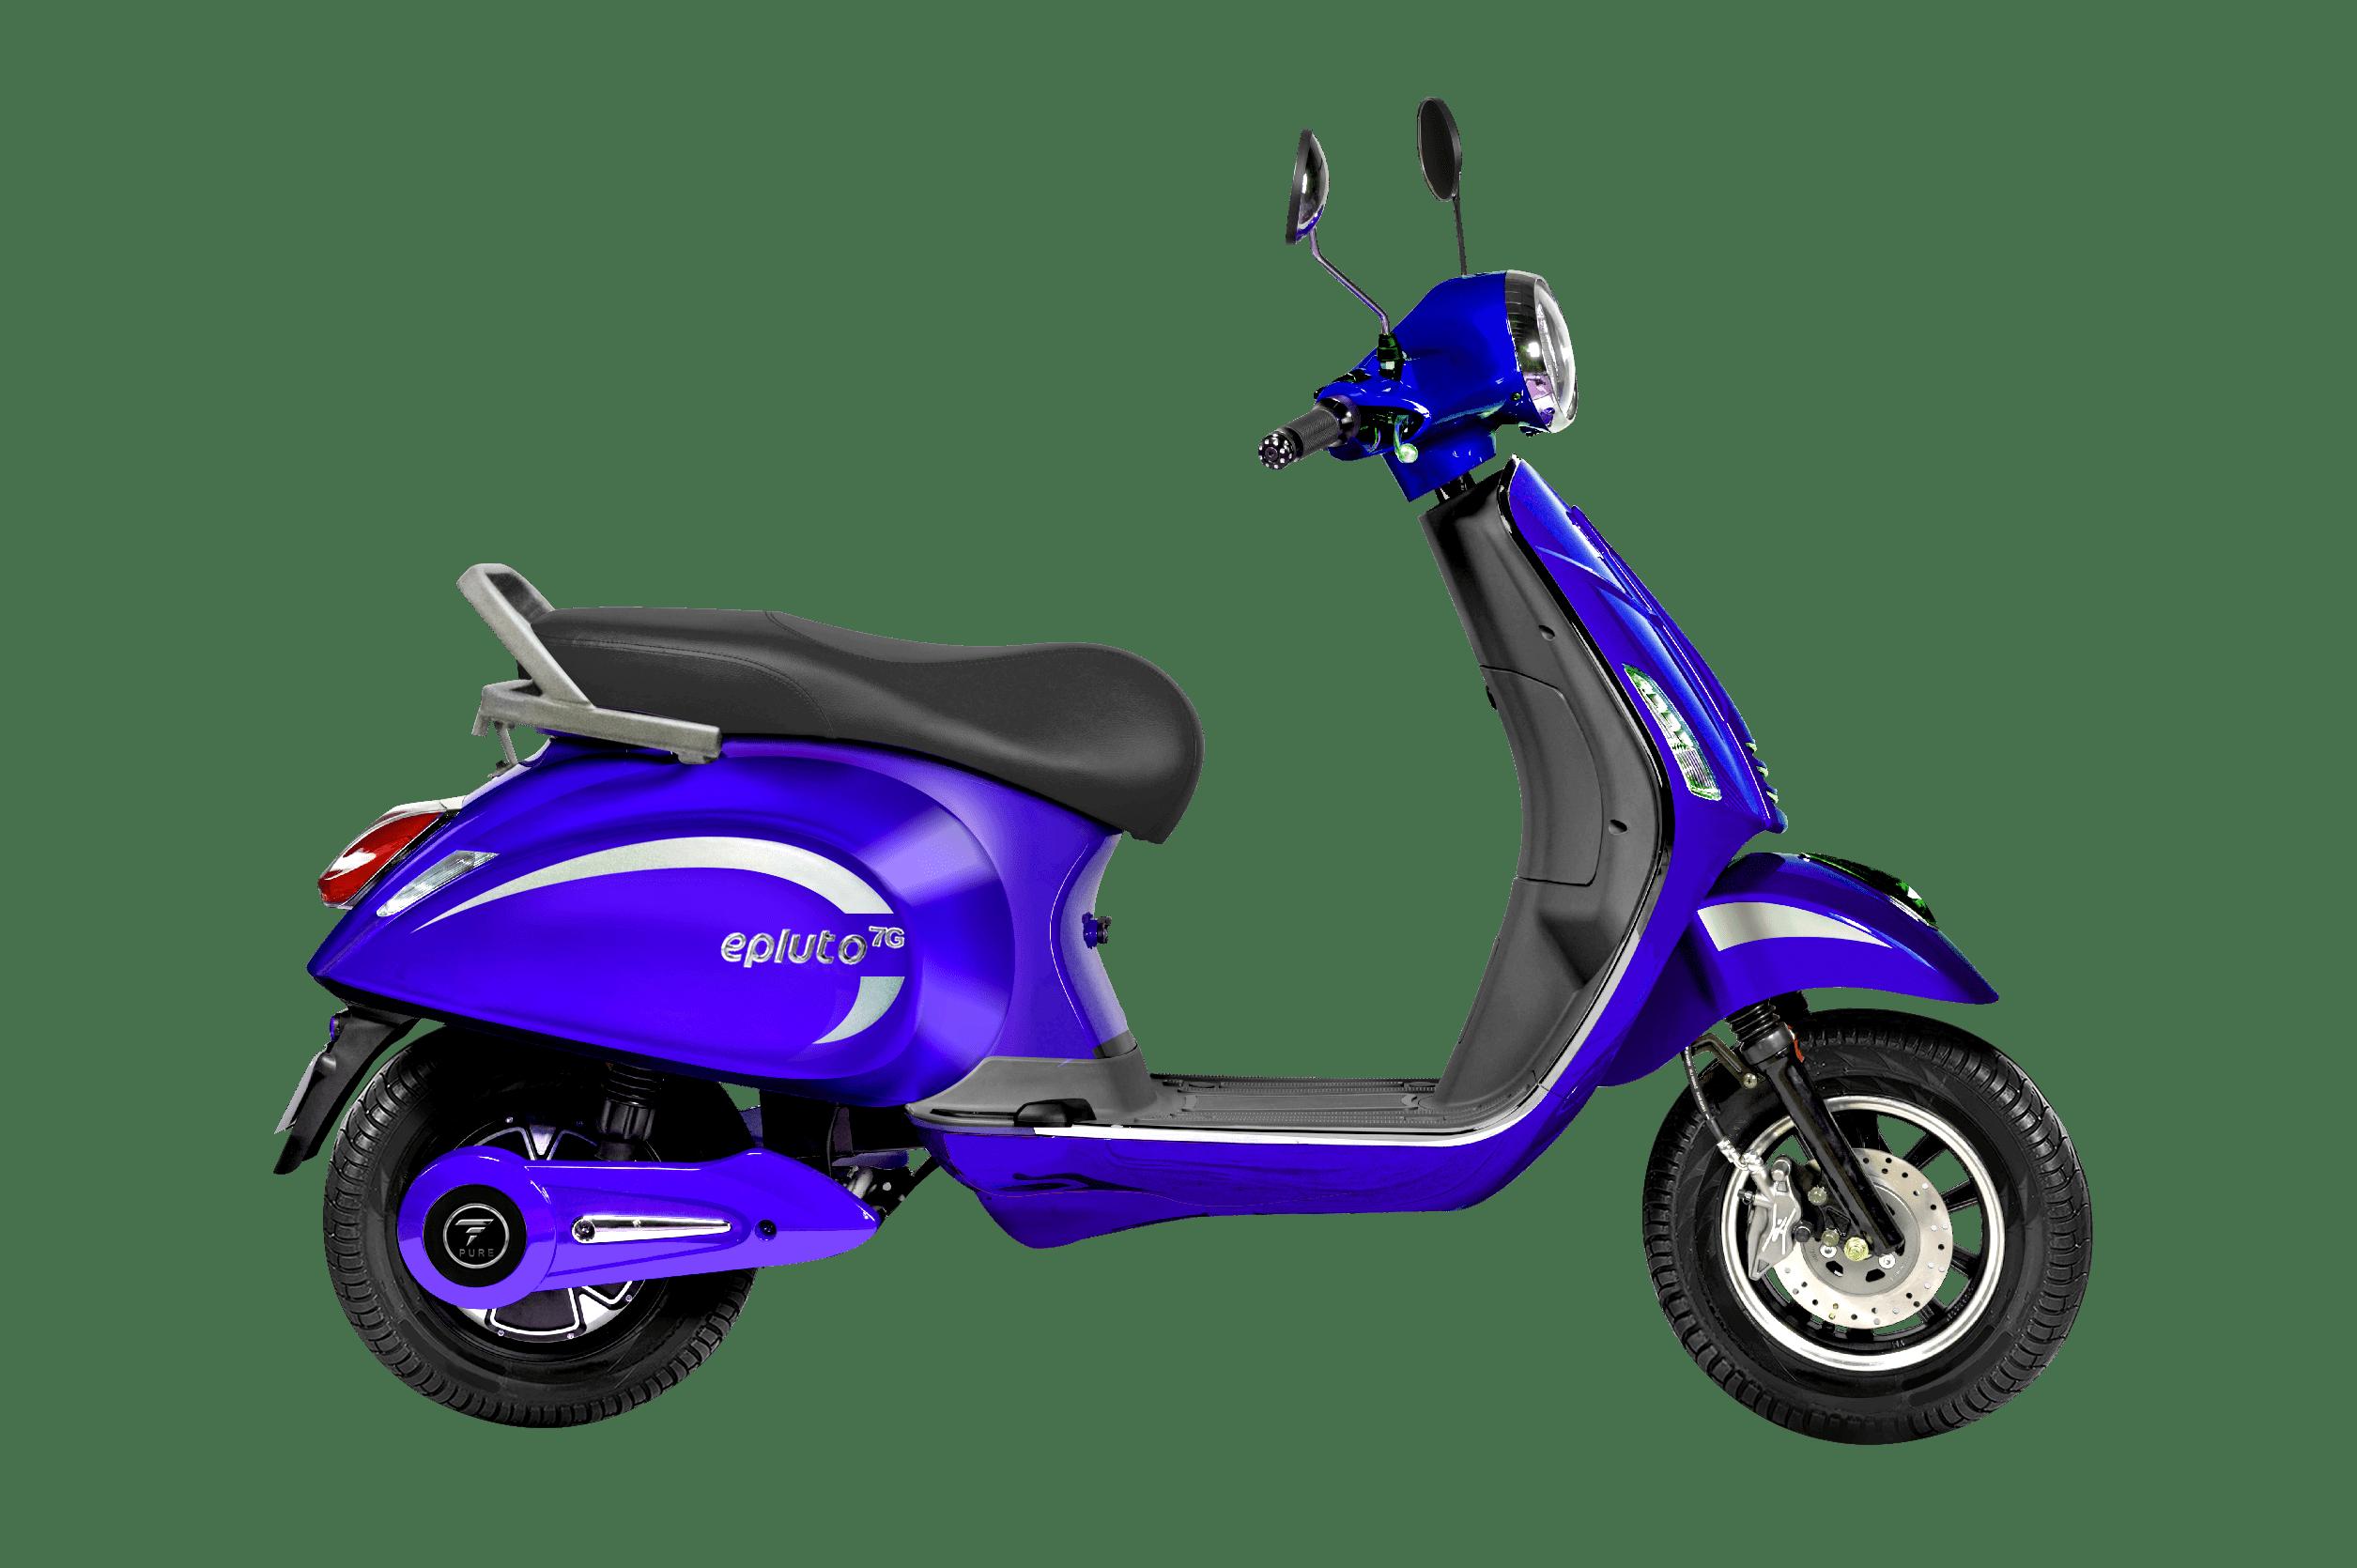 epluto blue